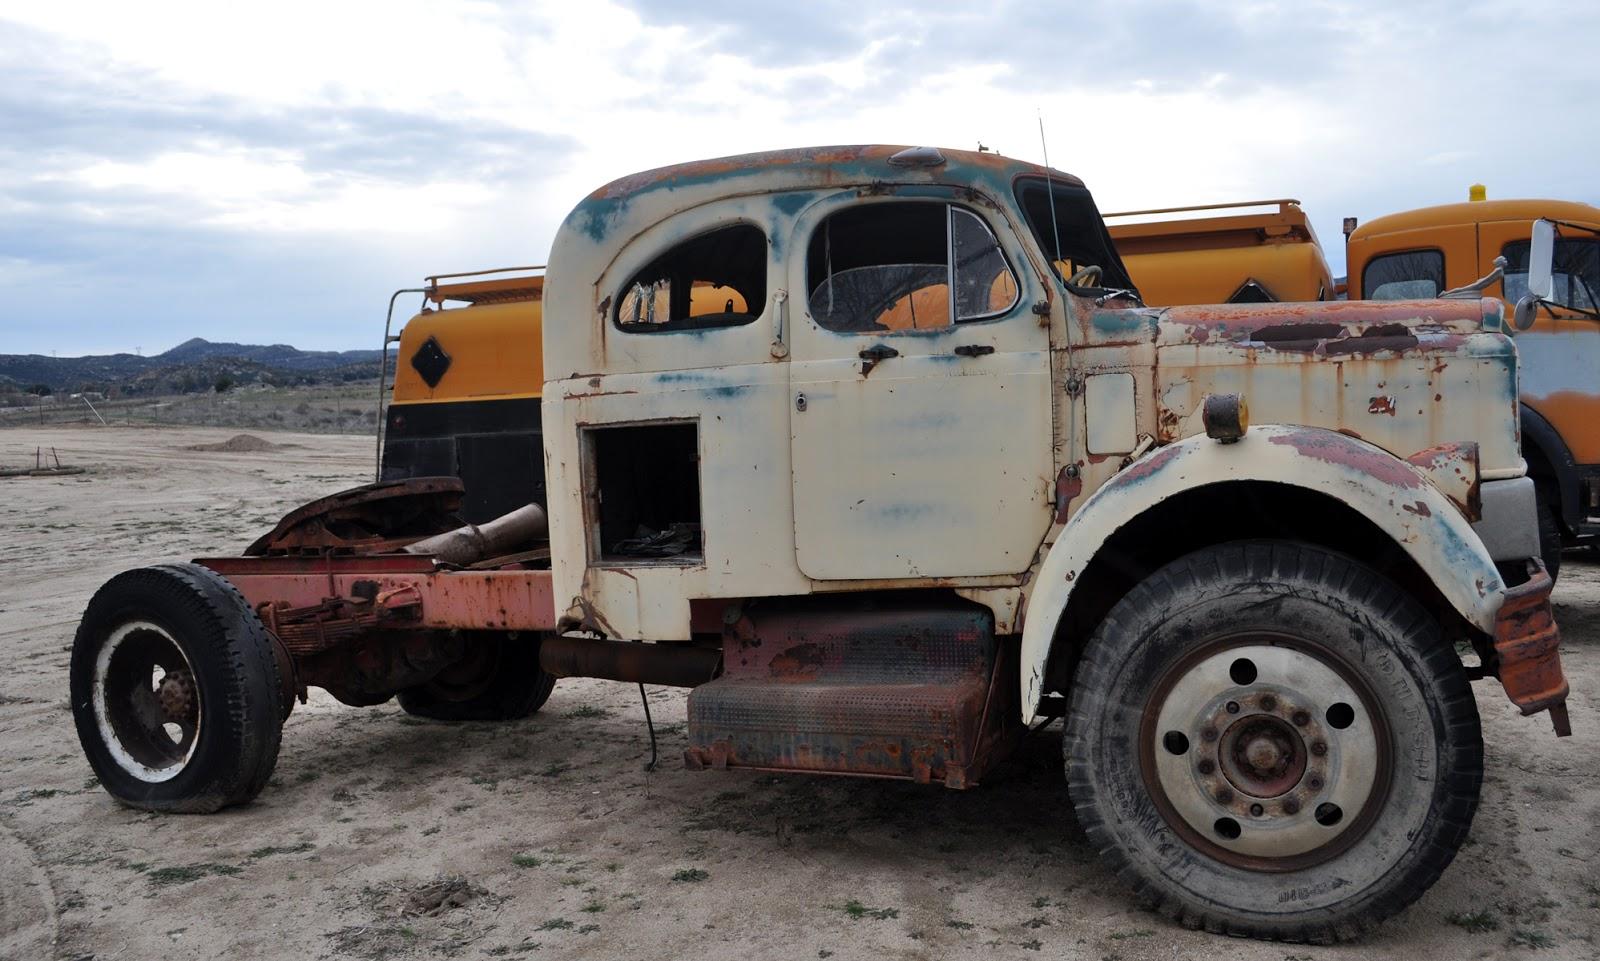 Craigslist Used Cars And Truck In Harrisonburg Virginia